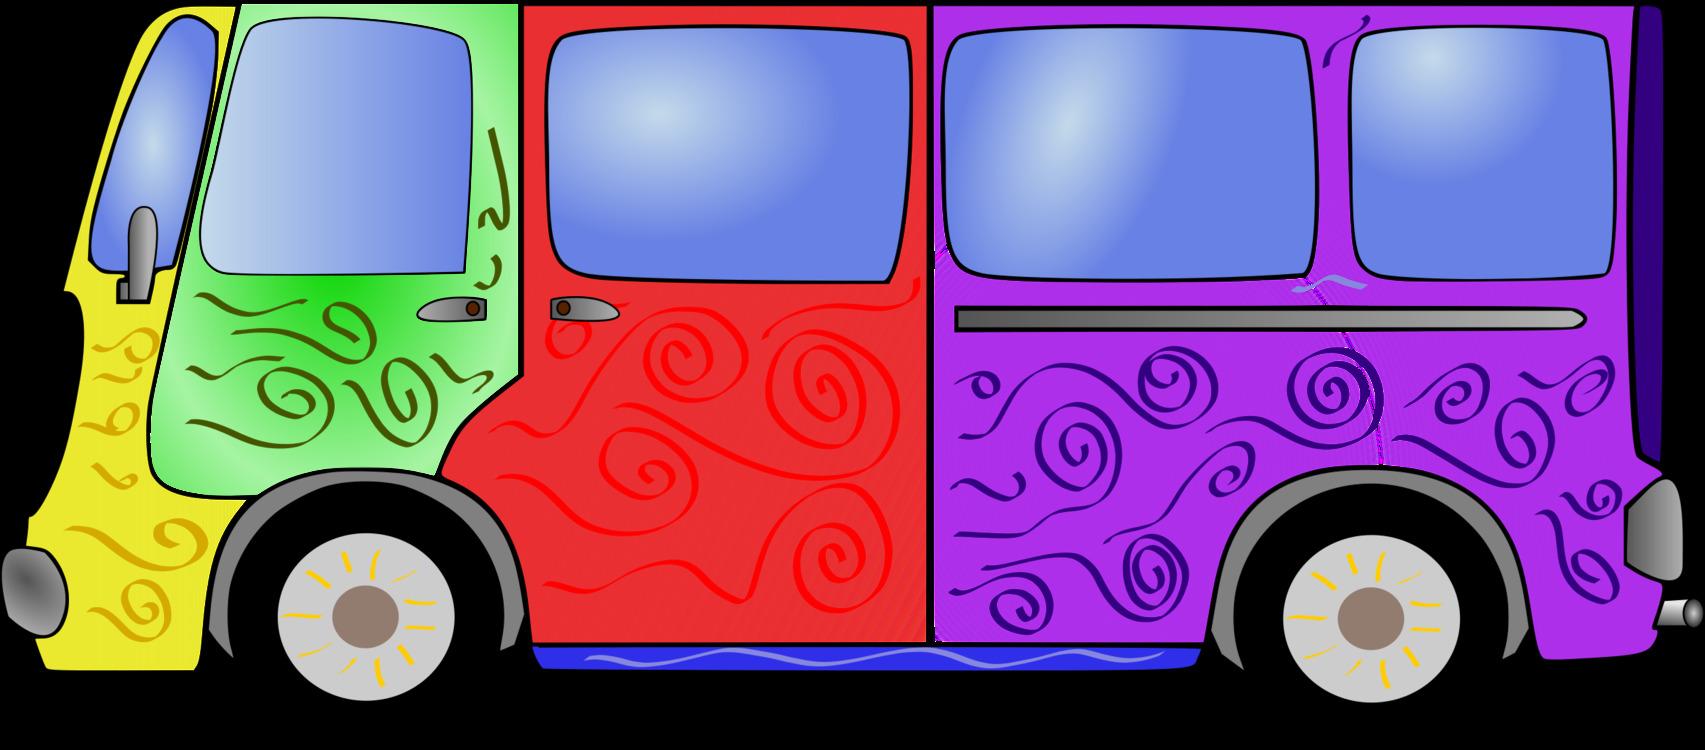 Pink,Compact Car,Purple